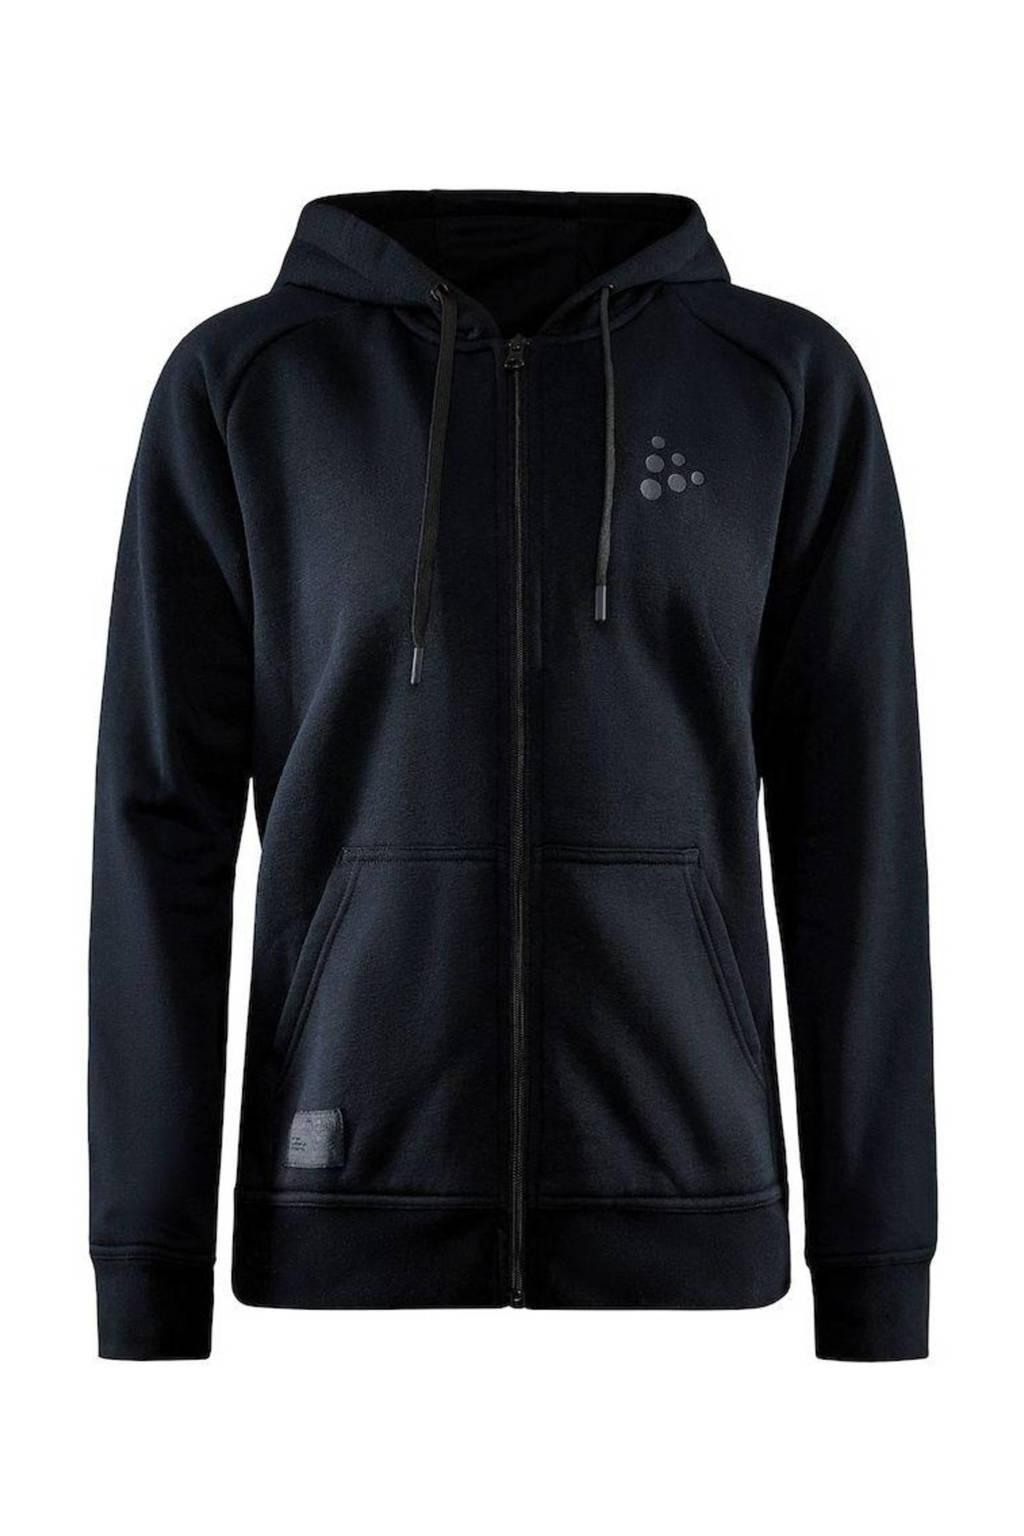 Craft sweatvest met logo zwart, Zwart